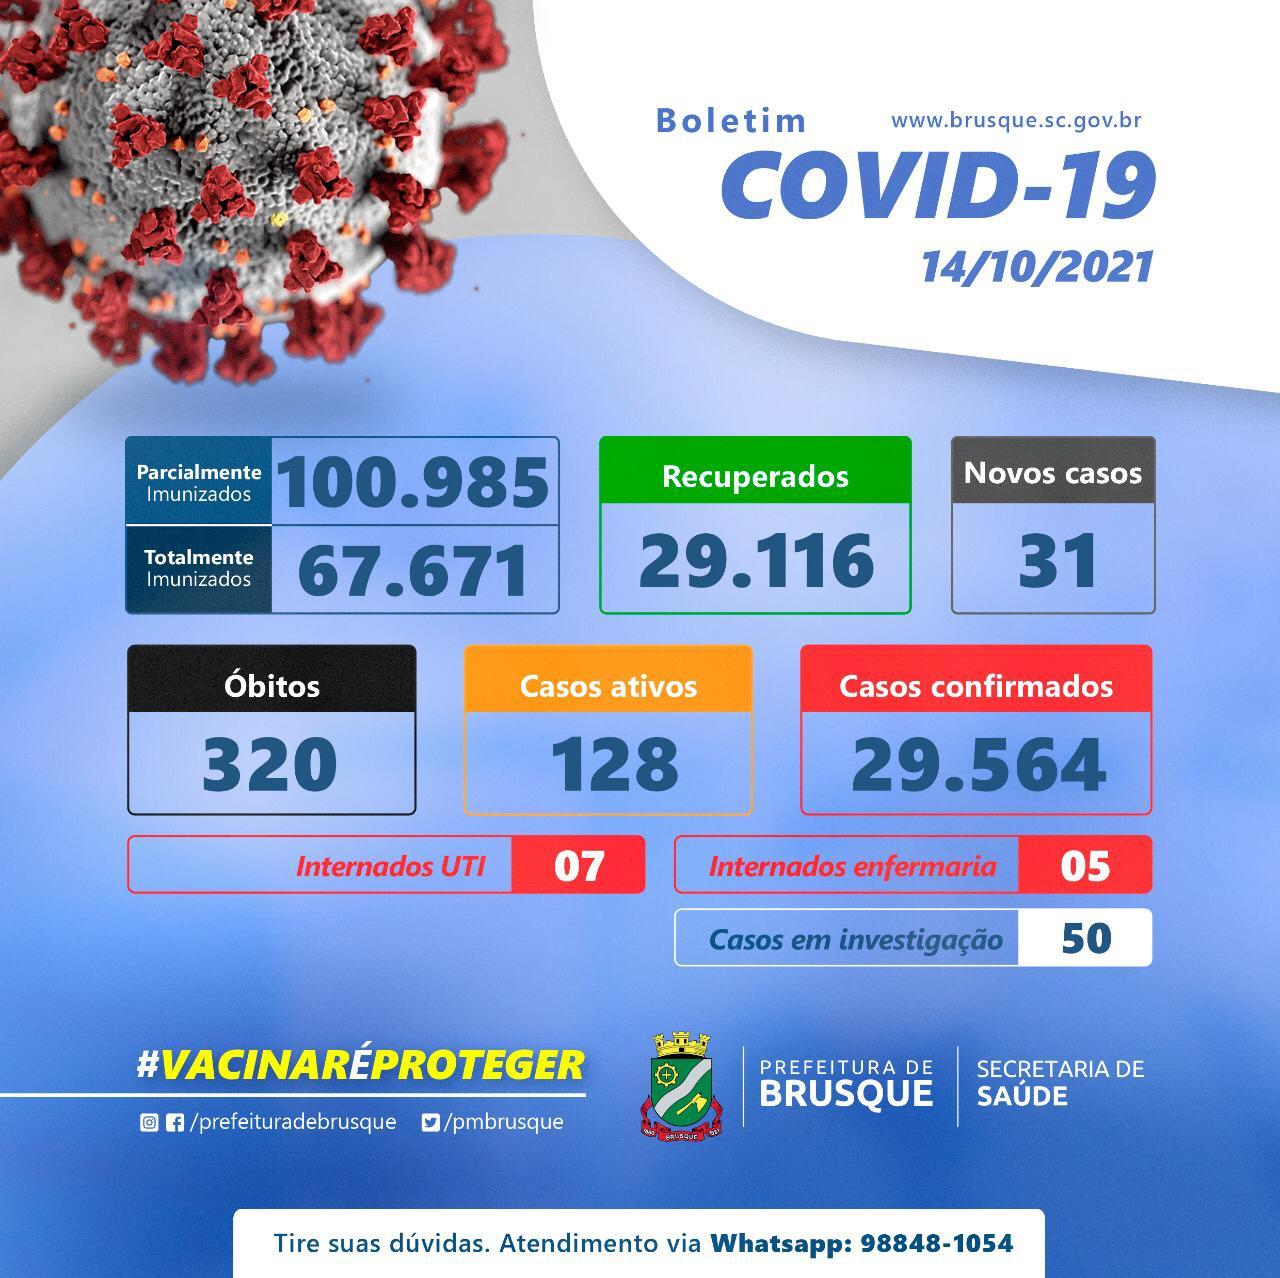 Covid-19: Confira o boletim epidemiológico desta quinta-feira (14)